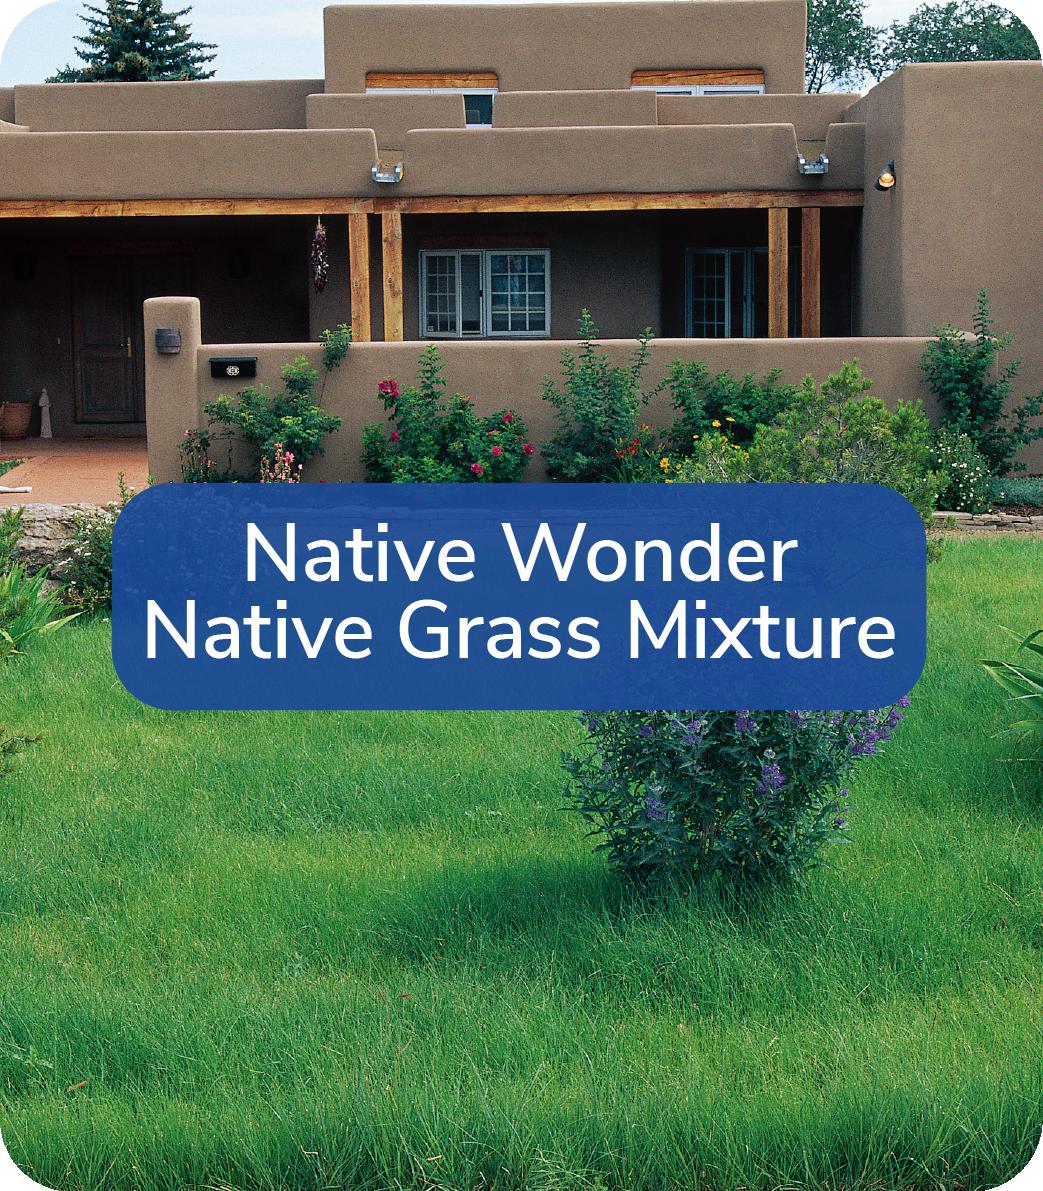 native wonder grass